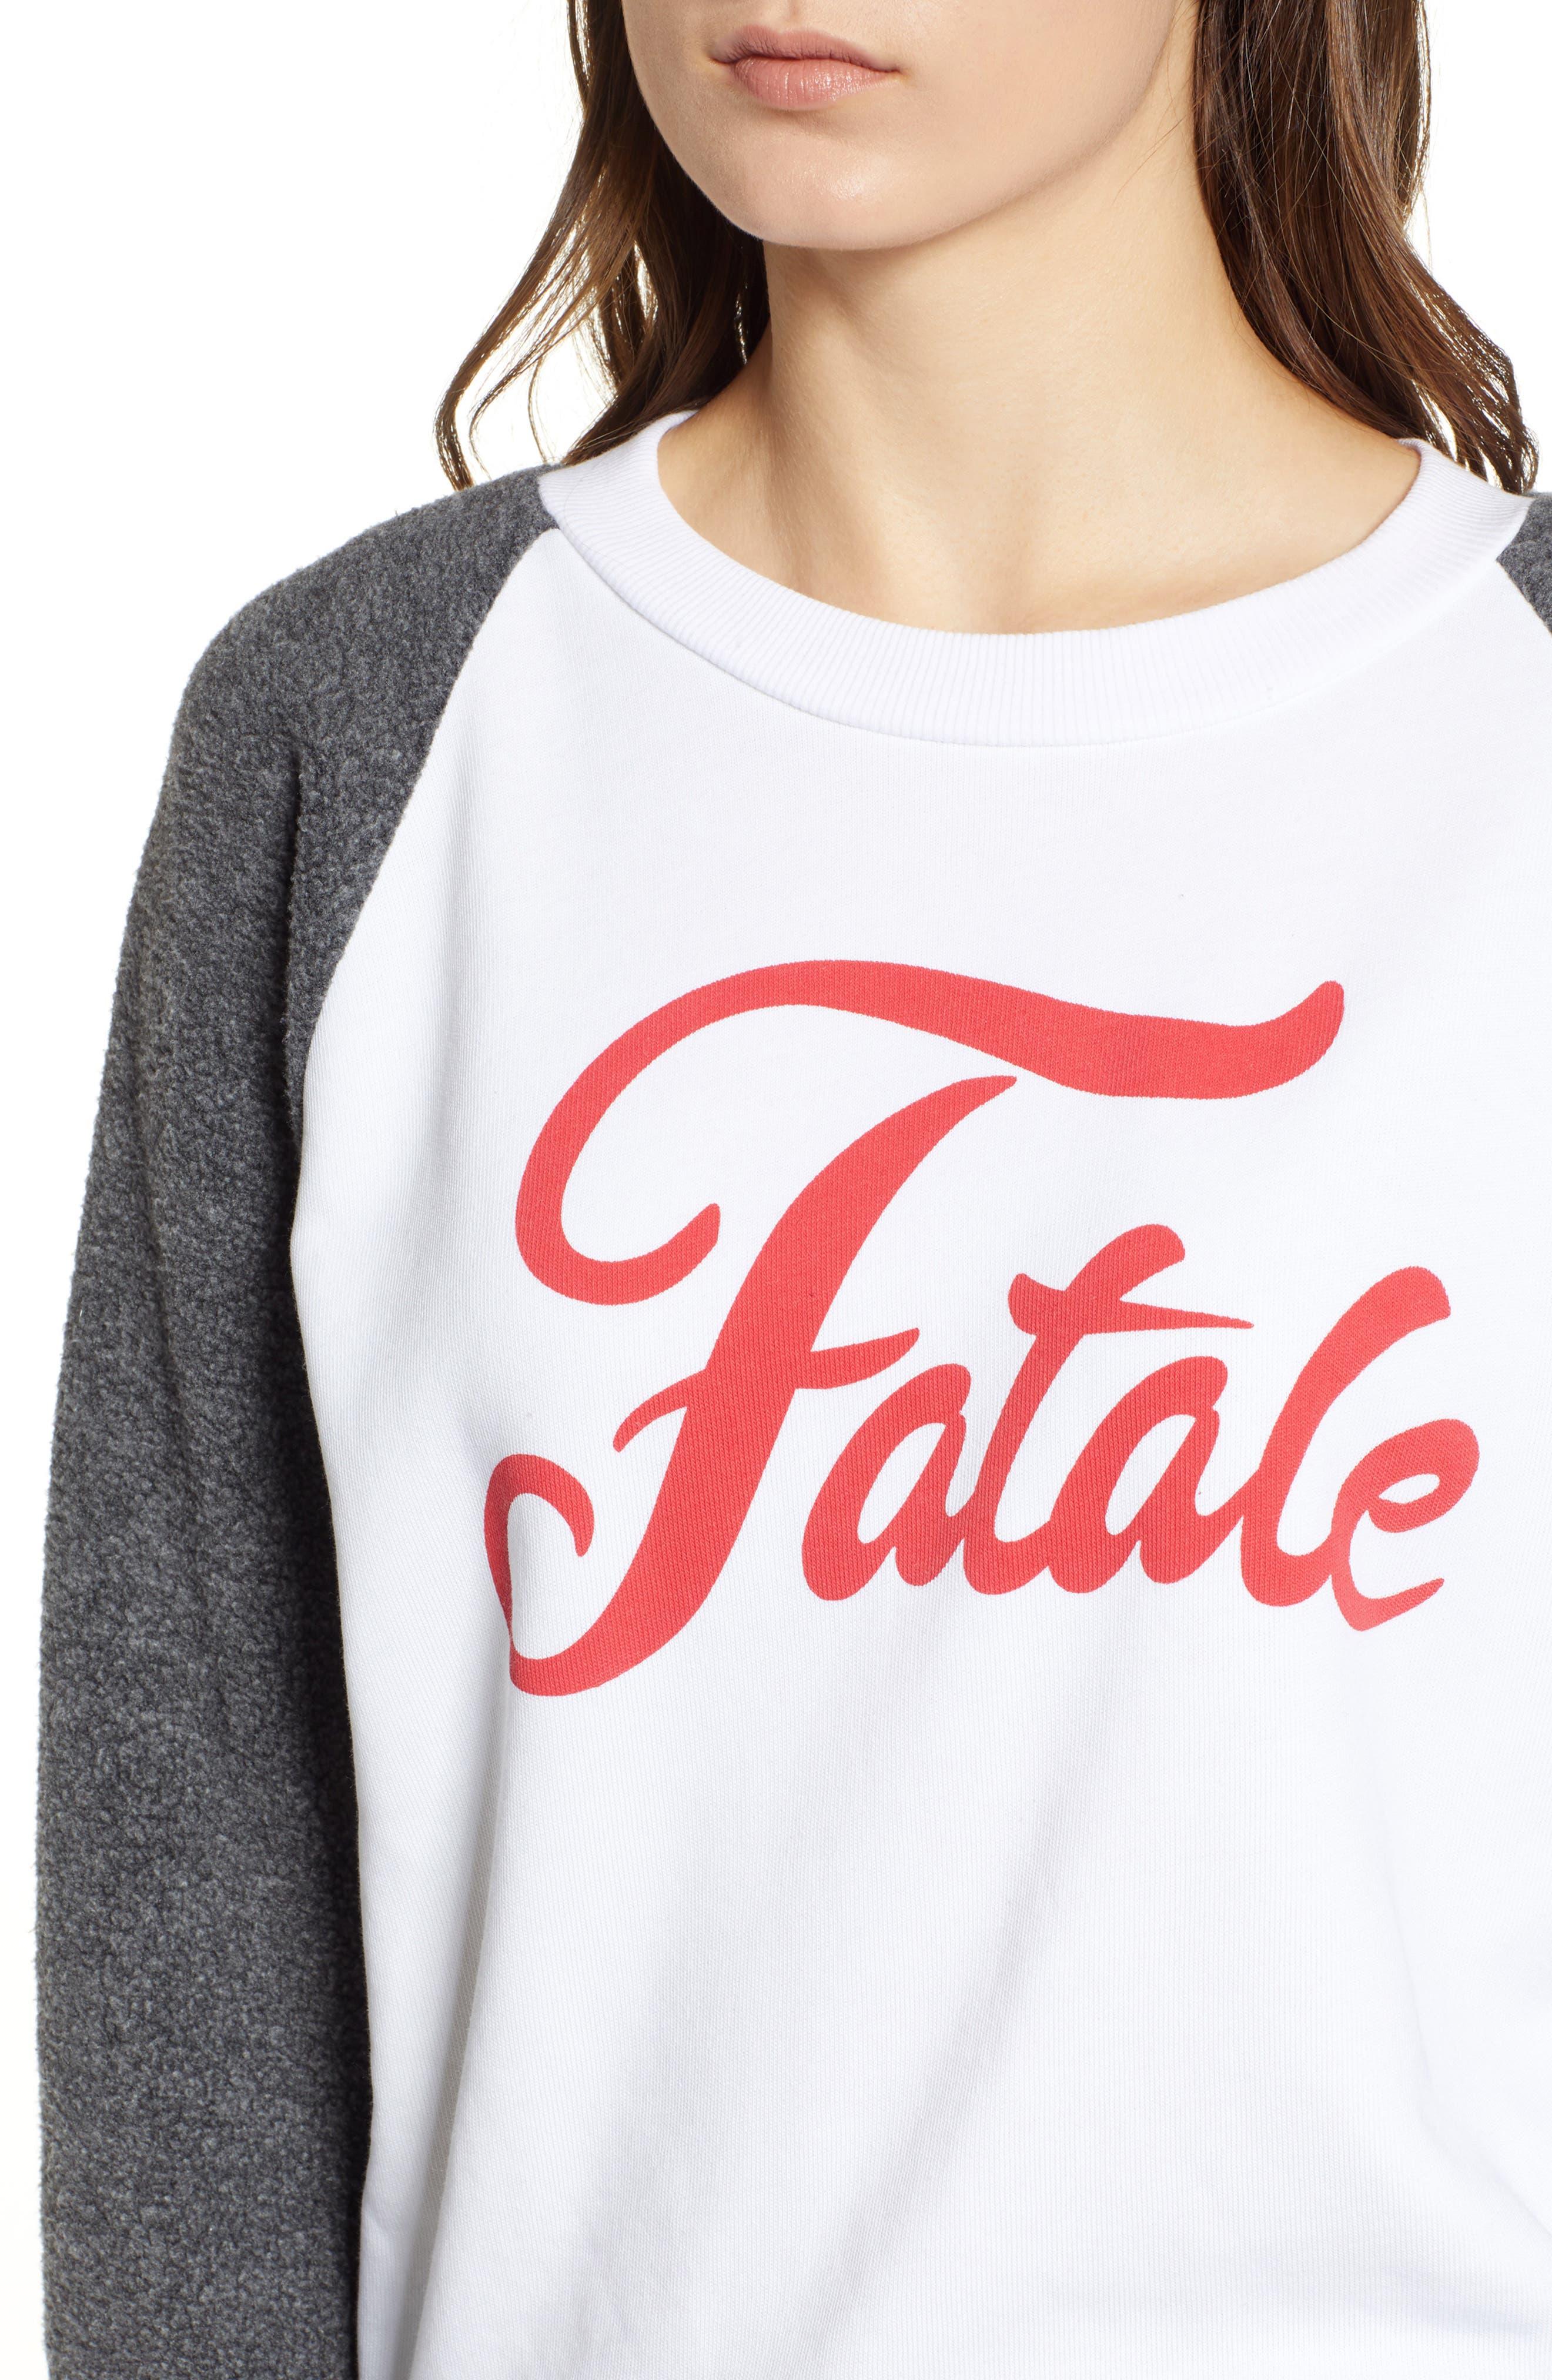 Fatale Fleece Sleeve Sweatshirt,                             Alternate thumbnail 4, color,                             CLEAN WHITE/ CLEAN BLACK